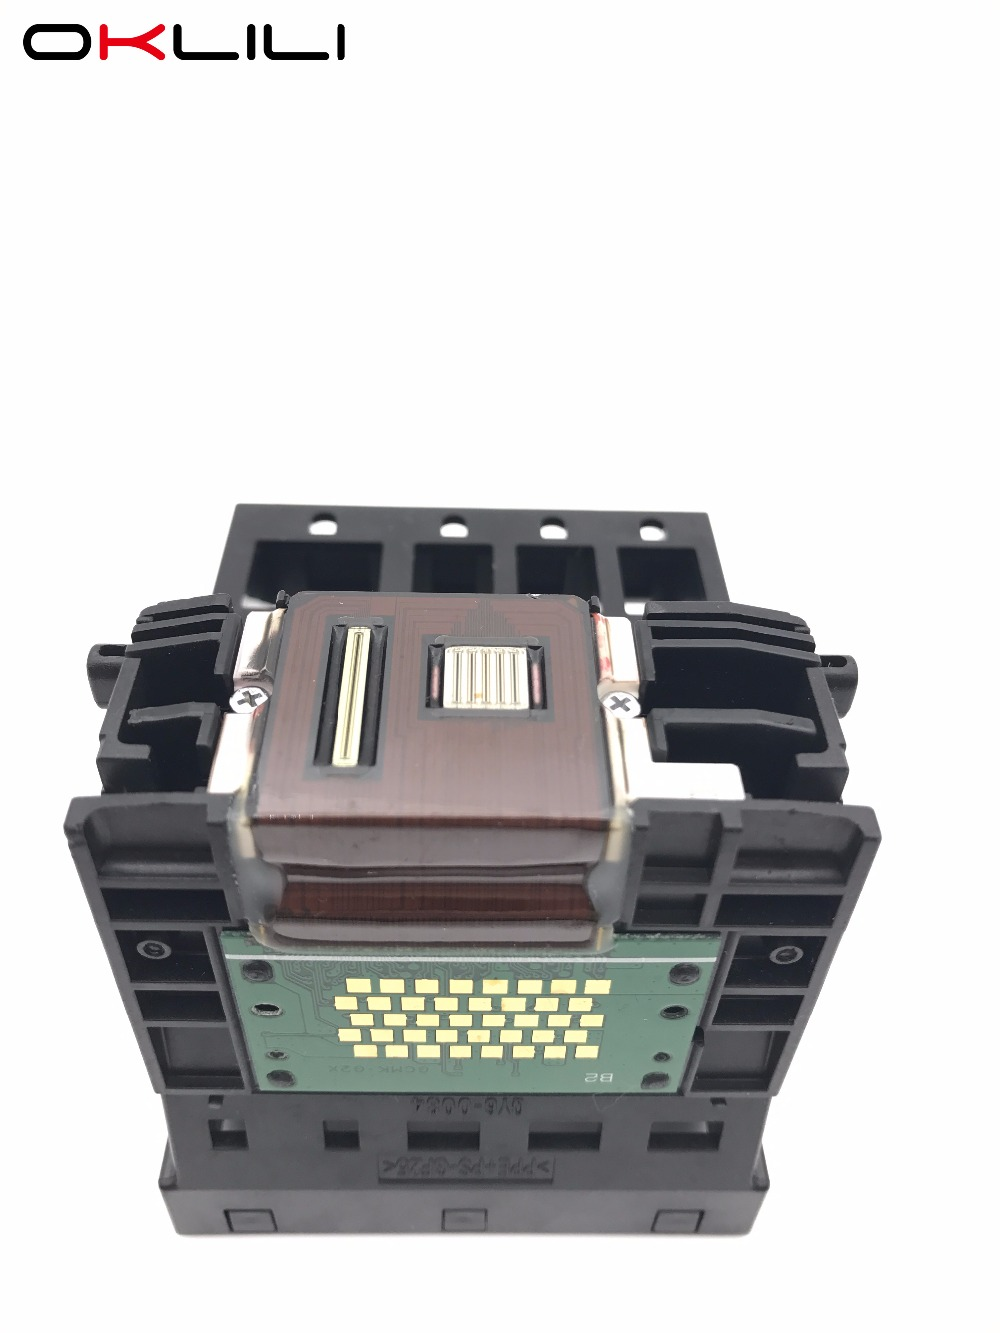 OKLILI ORIGINAL QY6-0034 Printhead Print Head for Canon S500 S520 S530D S600 S630 i6100 i6500 S6300 i650 MP F30 F50 C60 C70 good logistics free shipping qy6 0034 refurbished printhead for canon s520 i6100 i6500 s6300 printer accessory